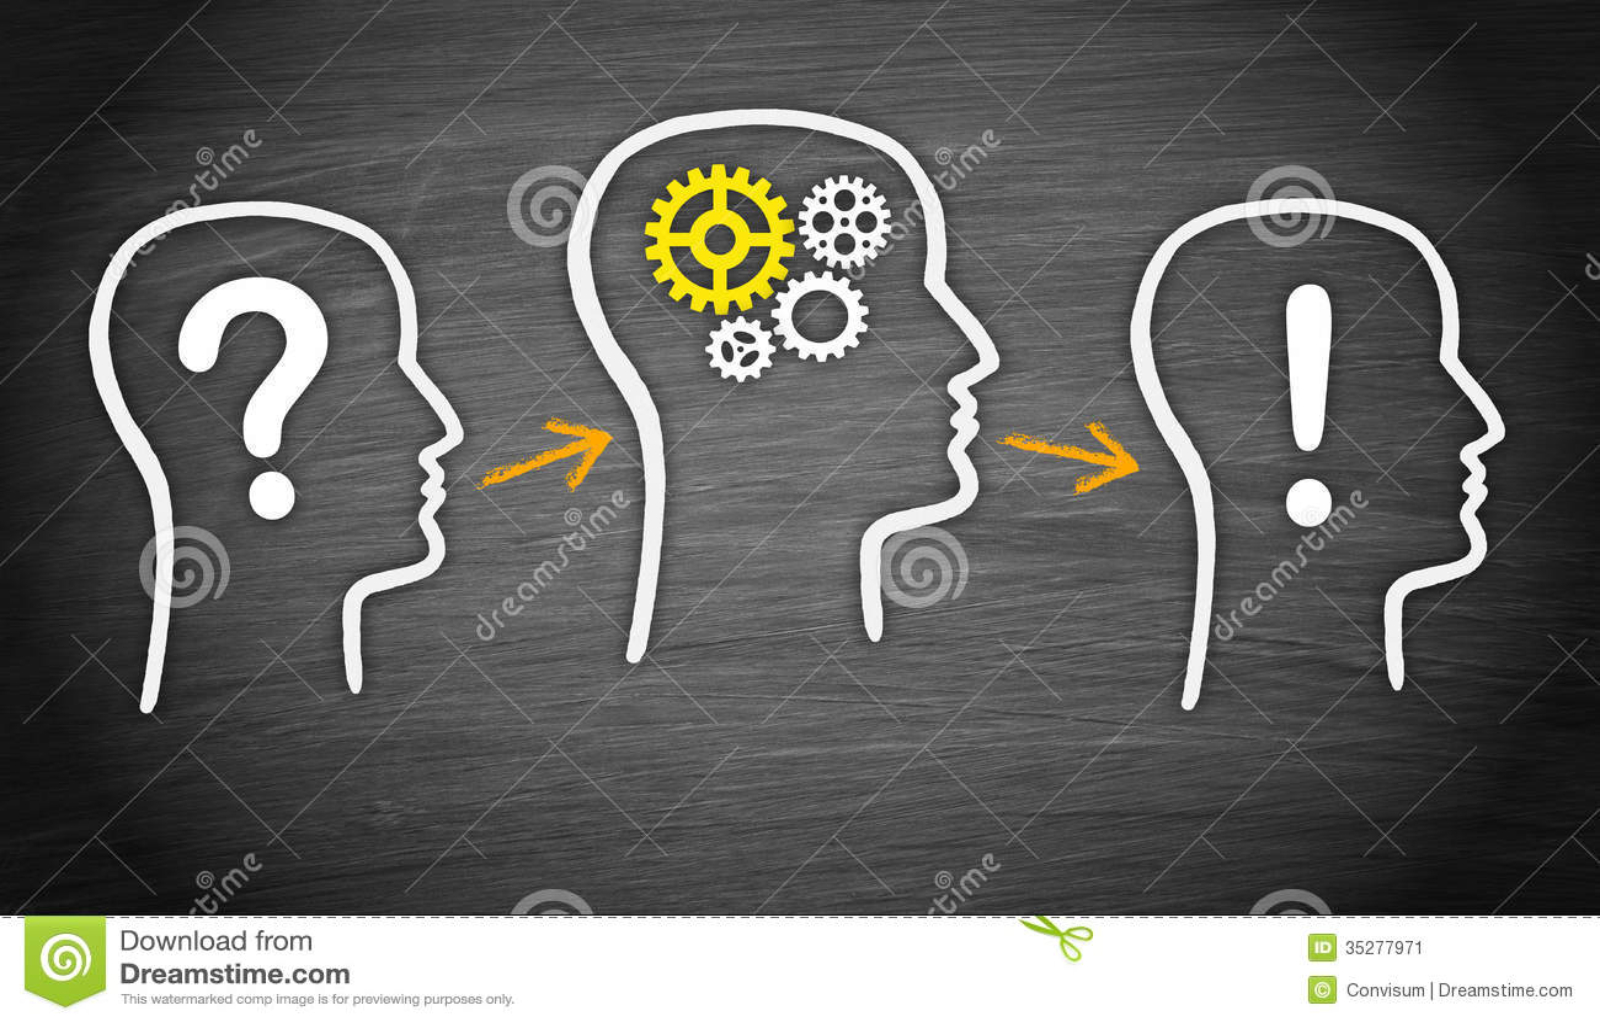 an analysis of human Analysis of human faces using a measurement-based skin reflectance model tim weyrich ∗ wojciech matusik † hanspeter pfister † bernd bickel ∗ craig donner ‡ chien tu † .